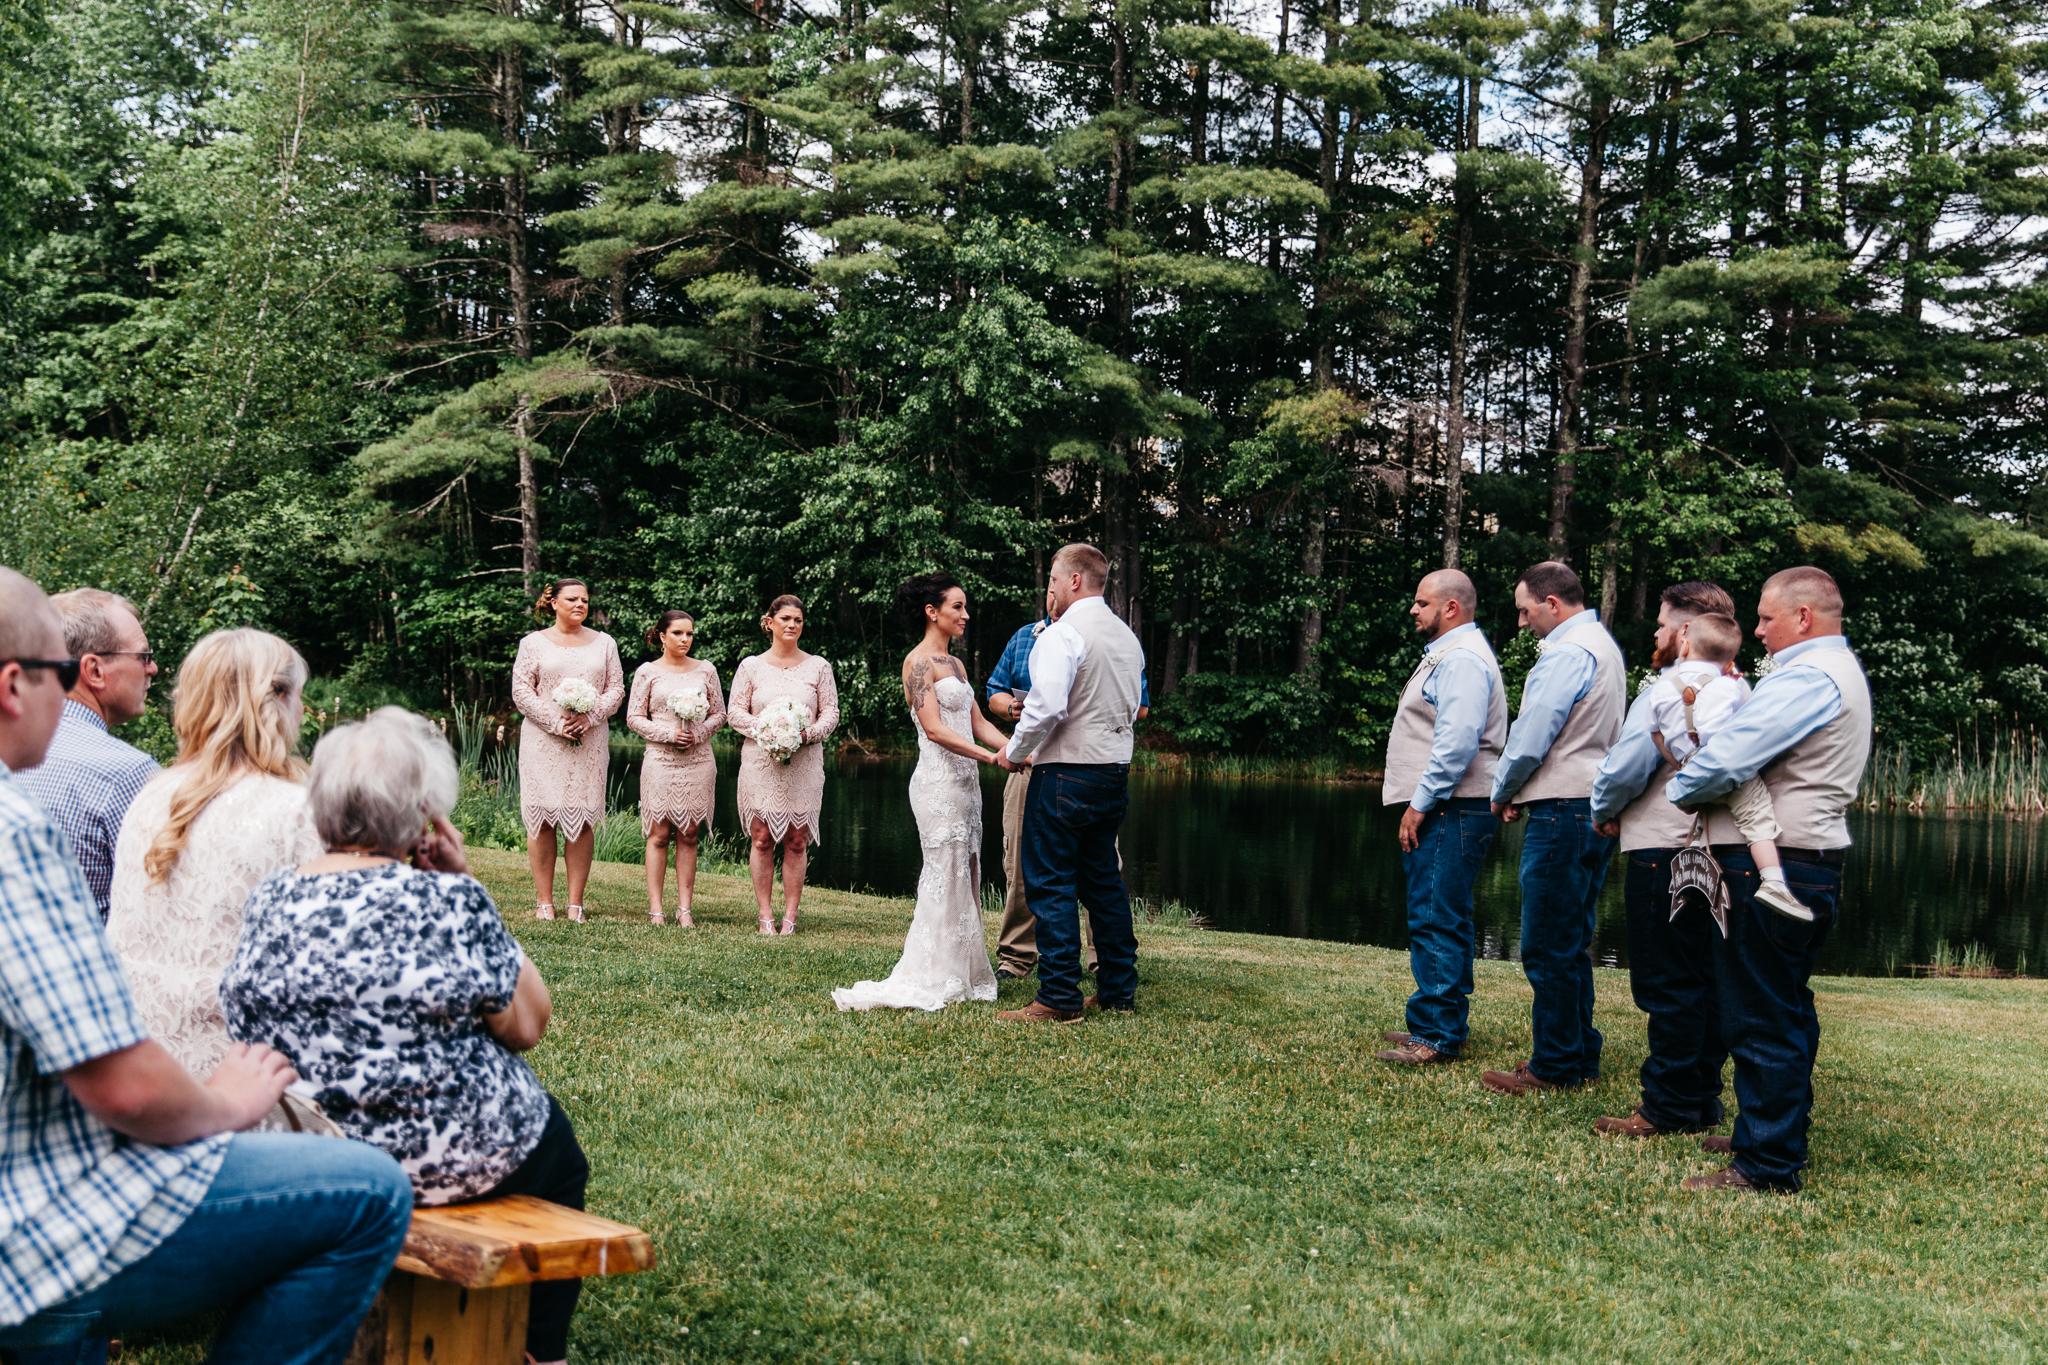 maine-wedding-ceremony-wedding-party.jpg